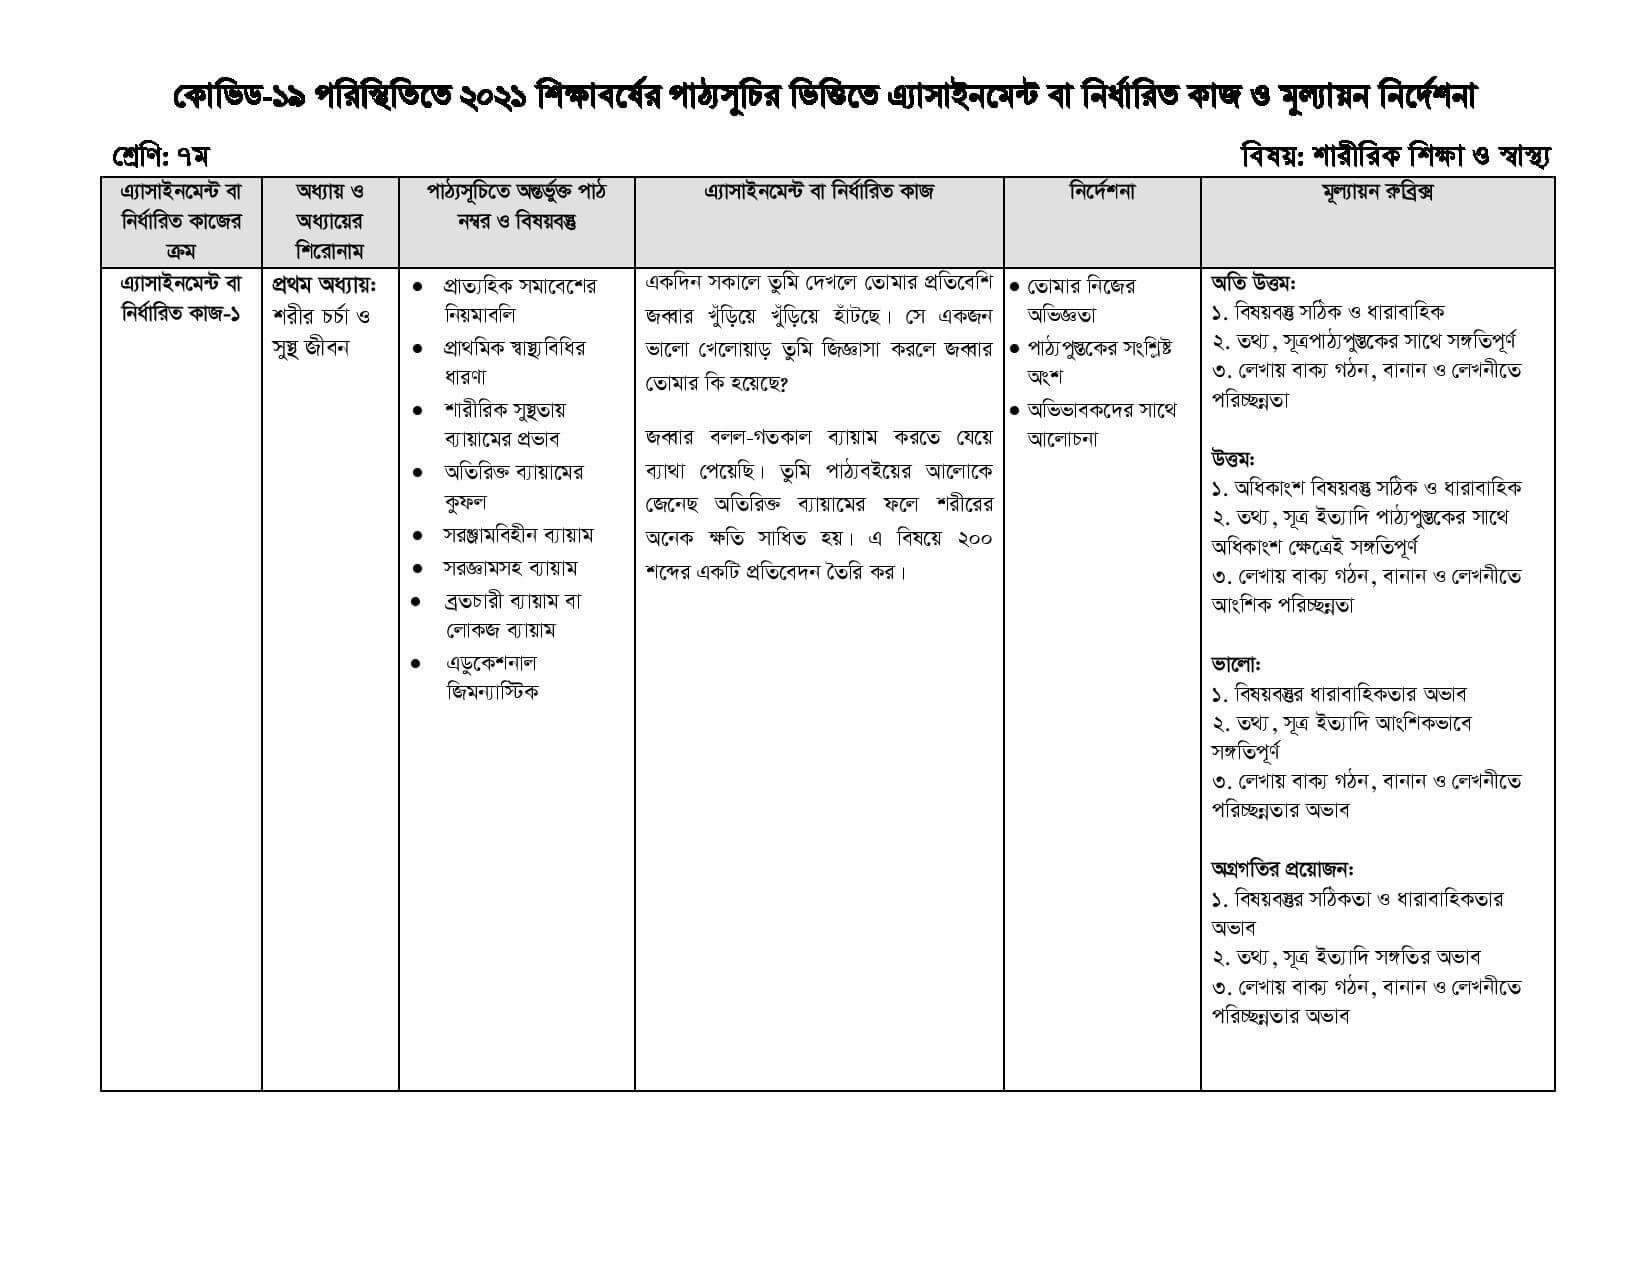 Class 7 10th Week Sharirik Shiksha o sasto Assignment Question